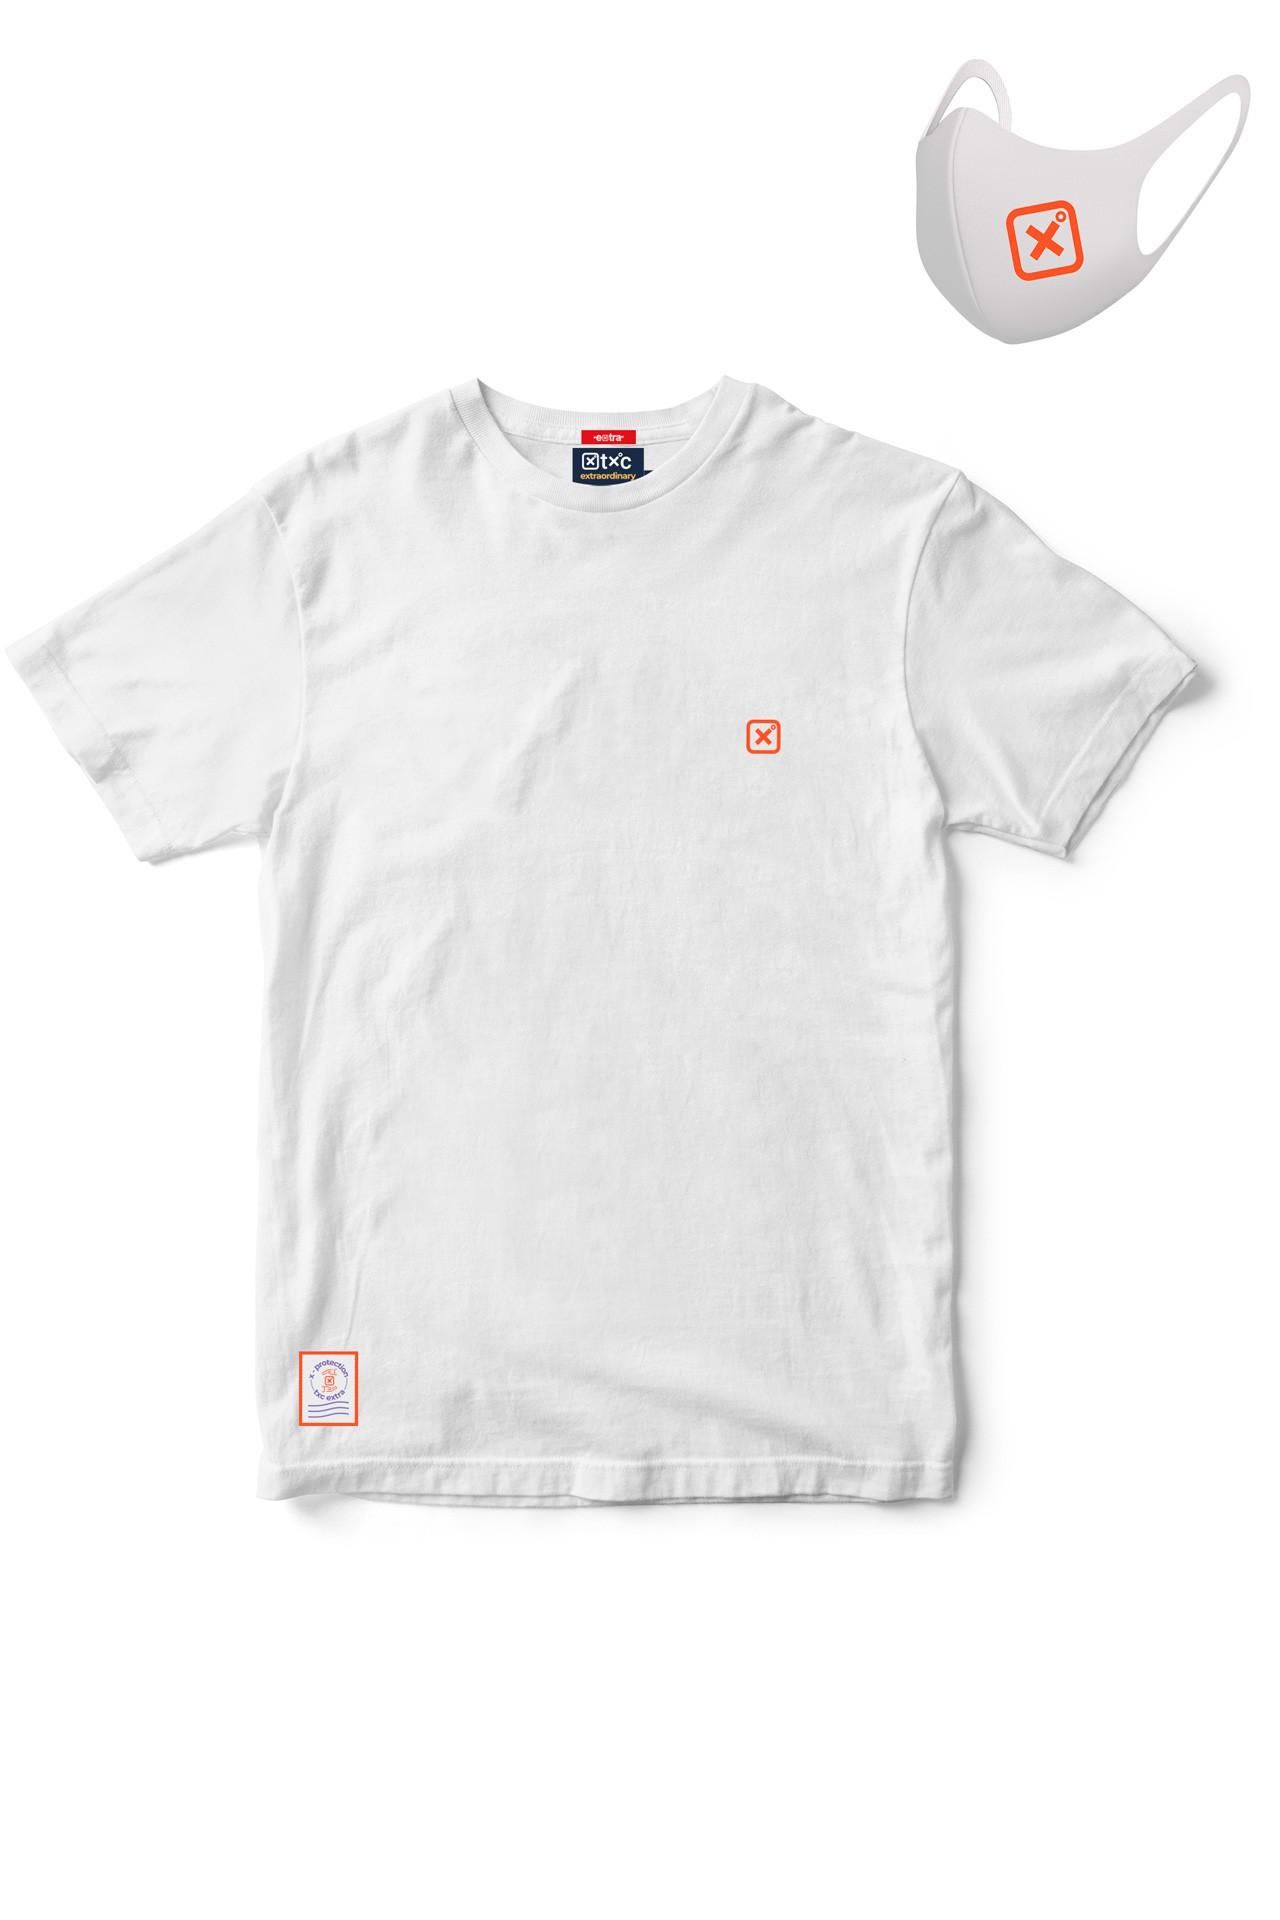 KIT Camiseta + Máscara Masculina X-Protection TXC 19162